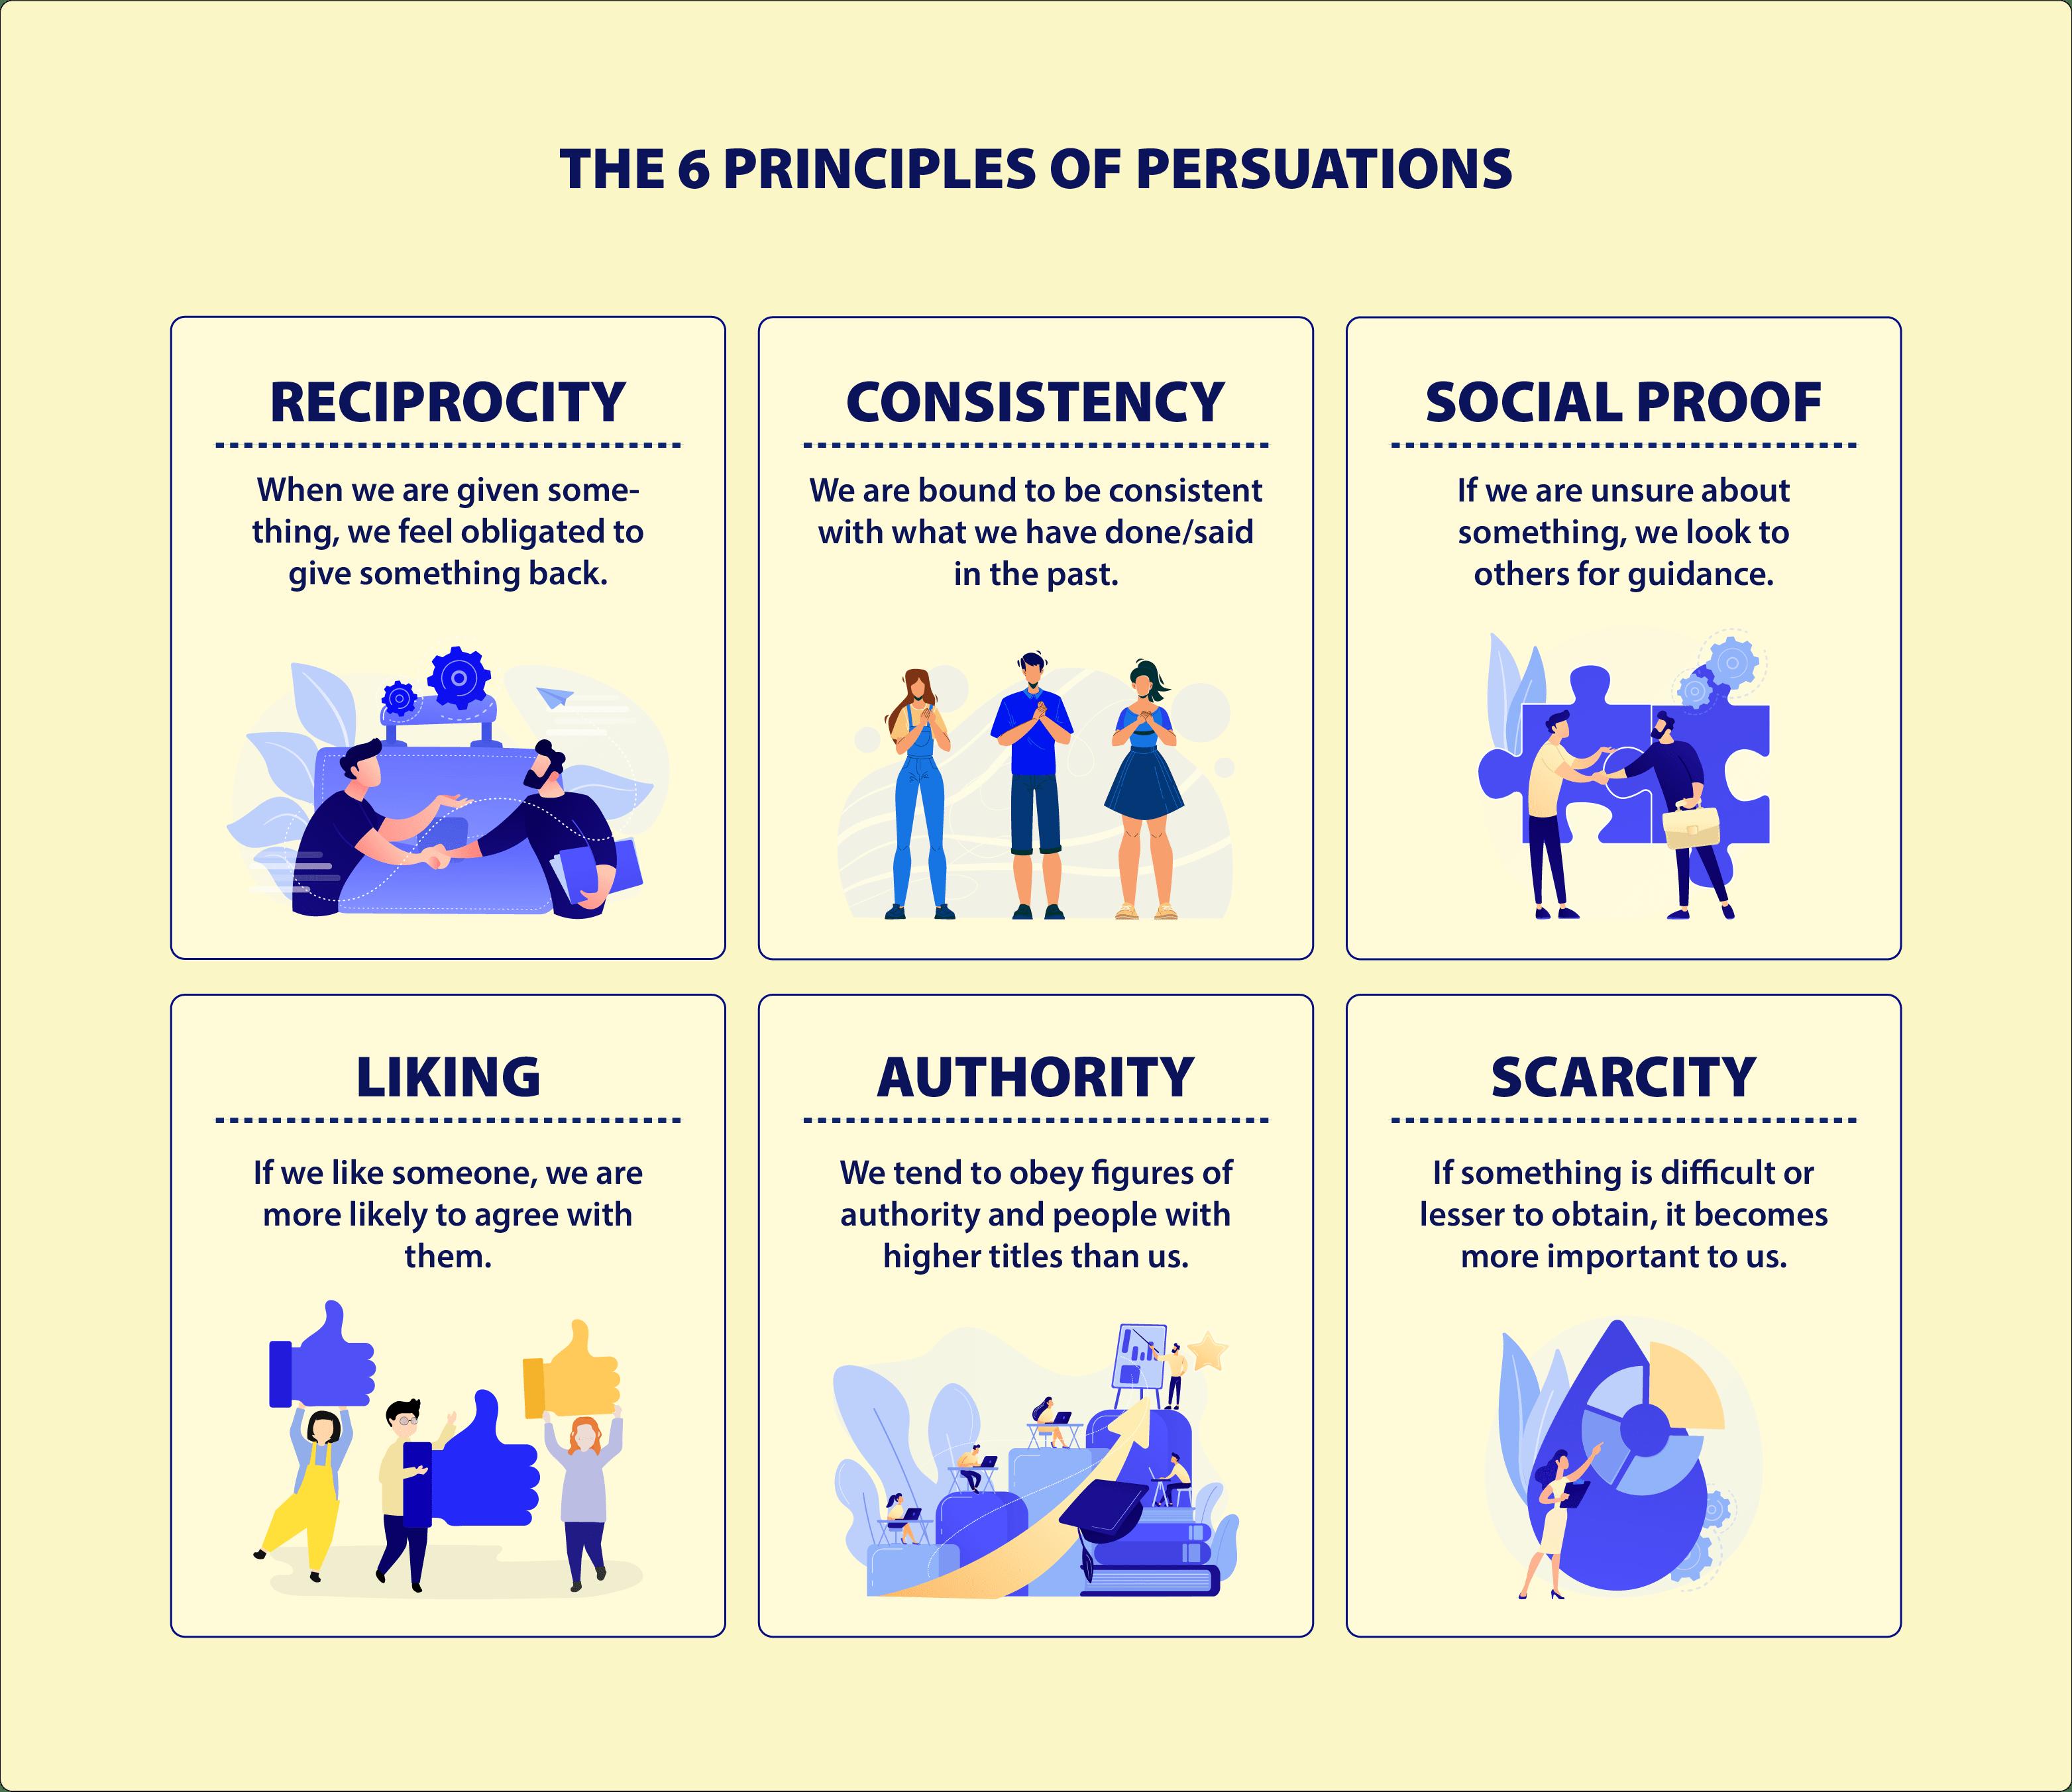 Image describing the six principles of persuasions